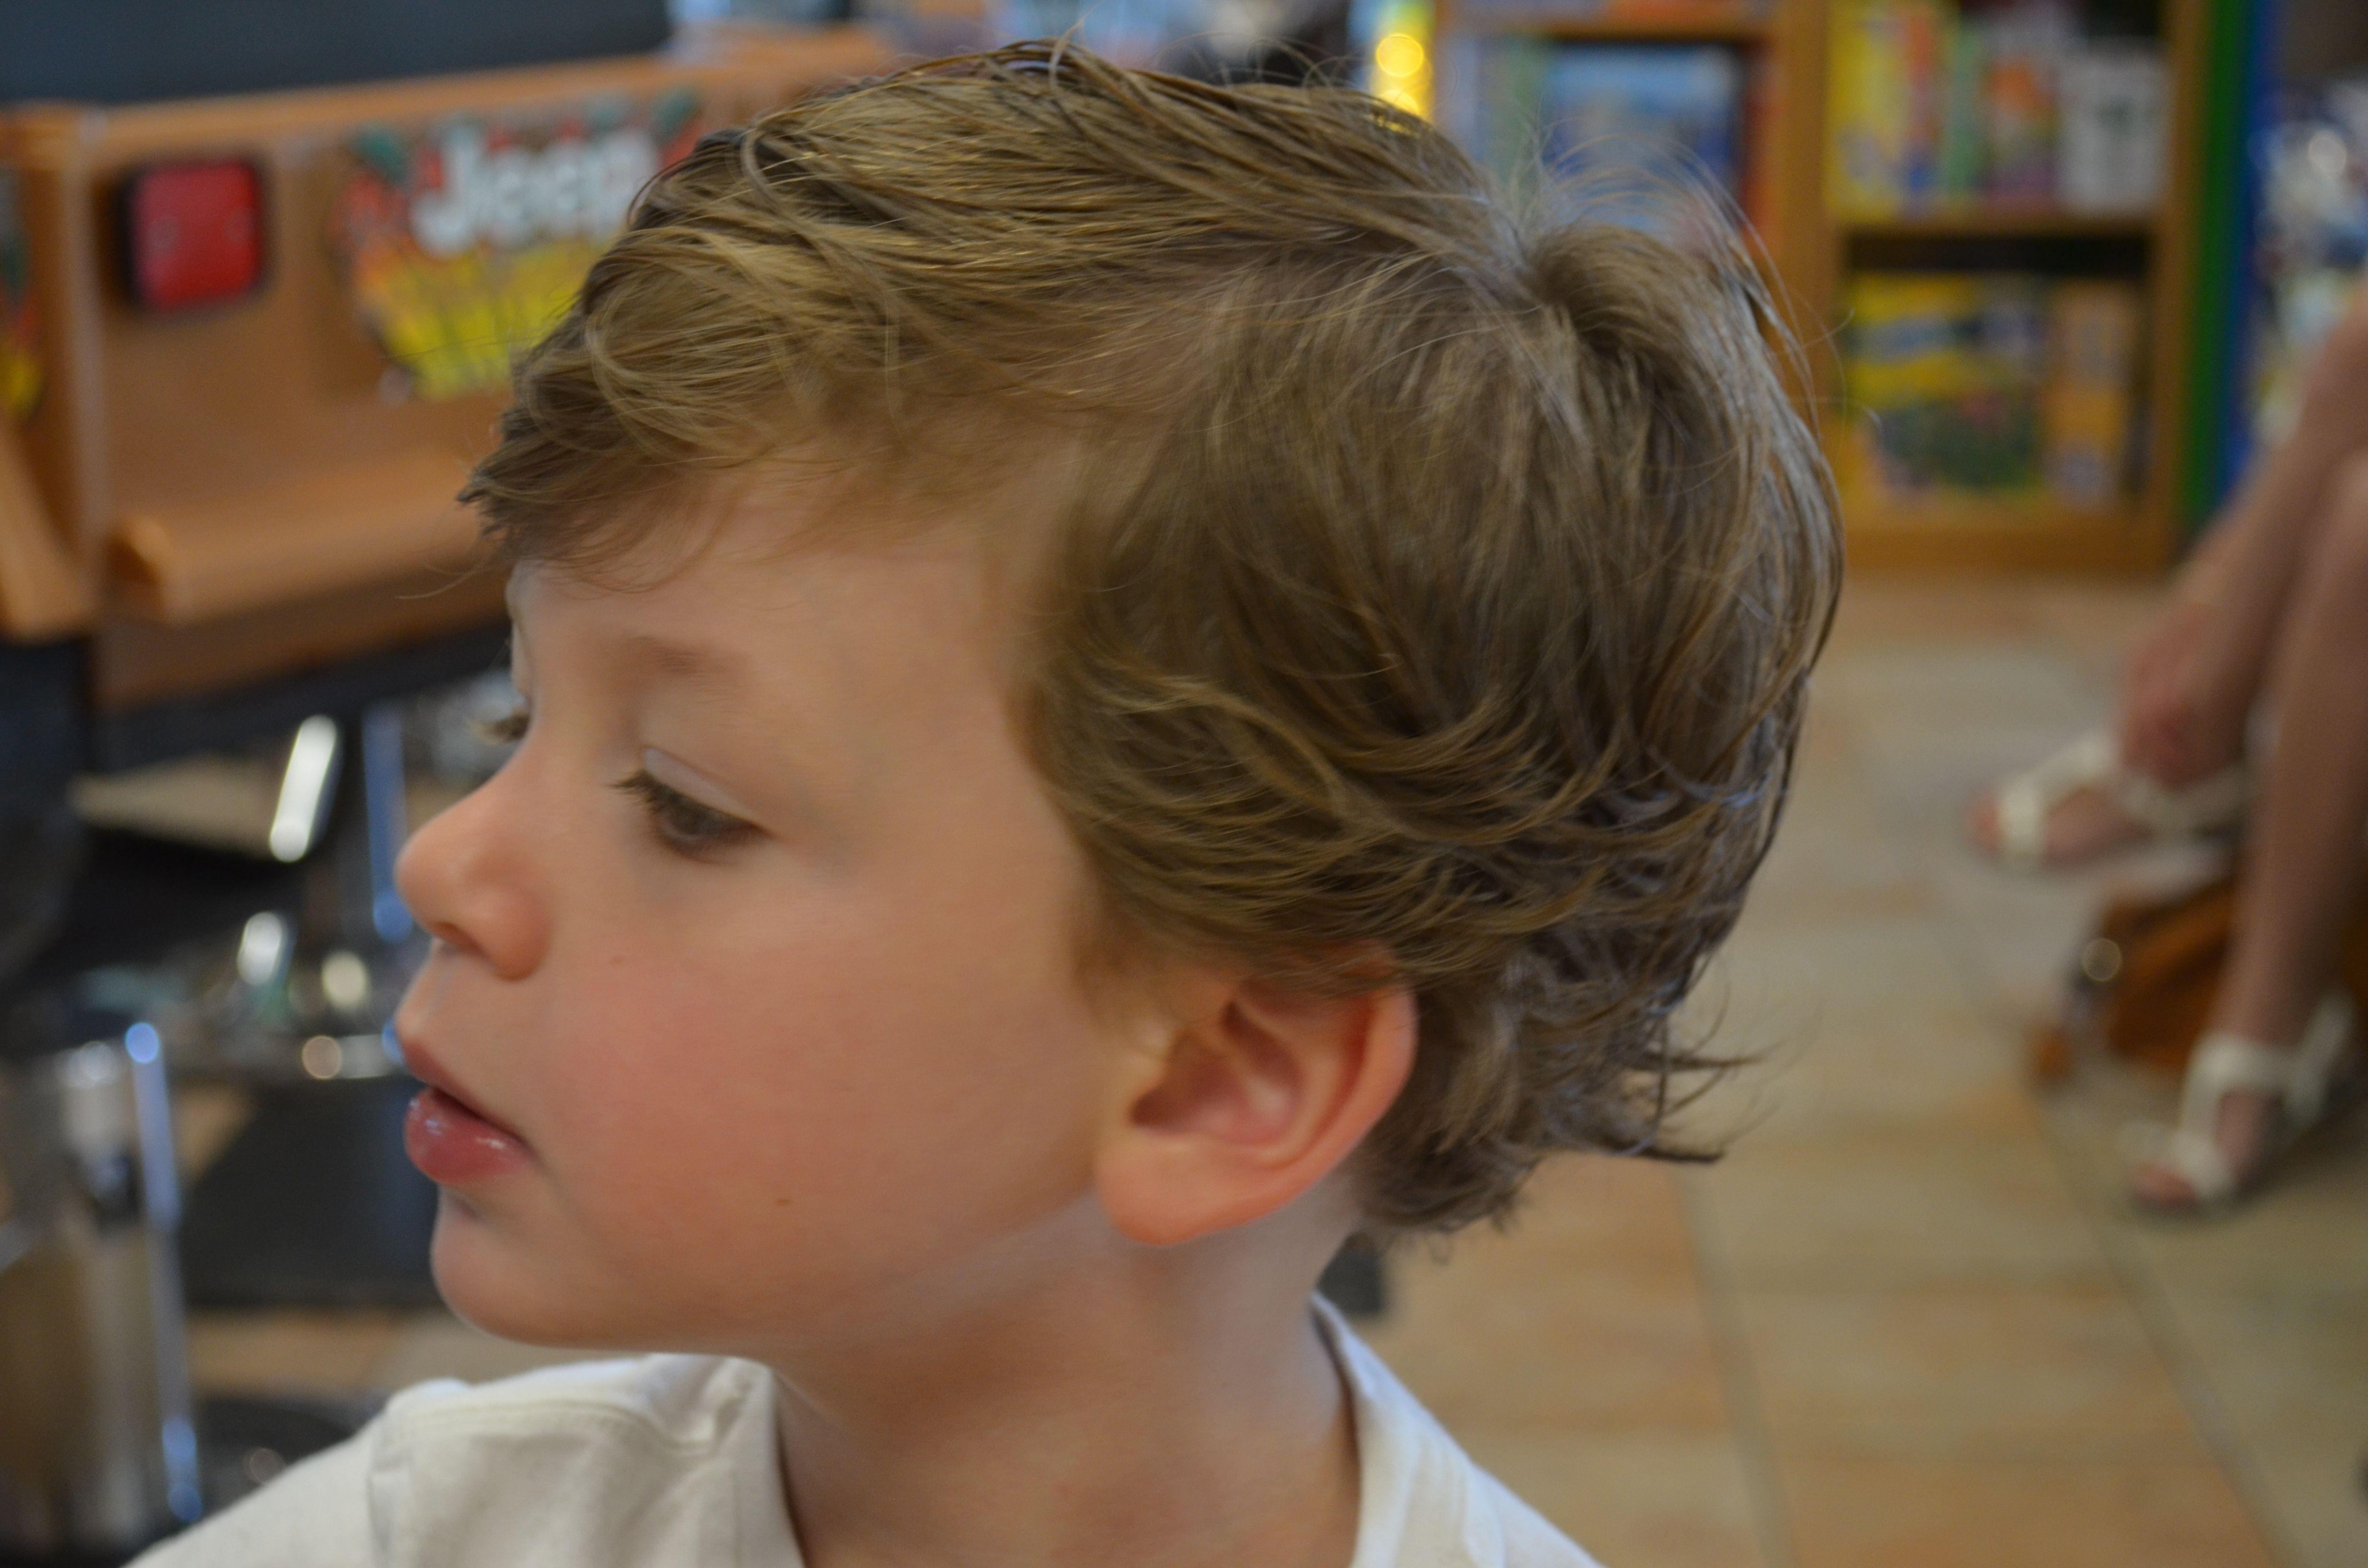 Pin By Dani Gaspard On Kidsnips Haircuts For Boys Little Boy Haircuts Boys Haircuts Girl Haircuts